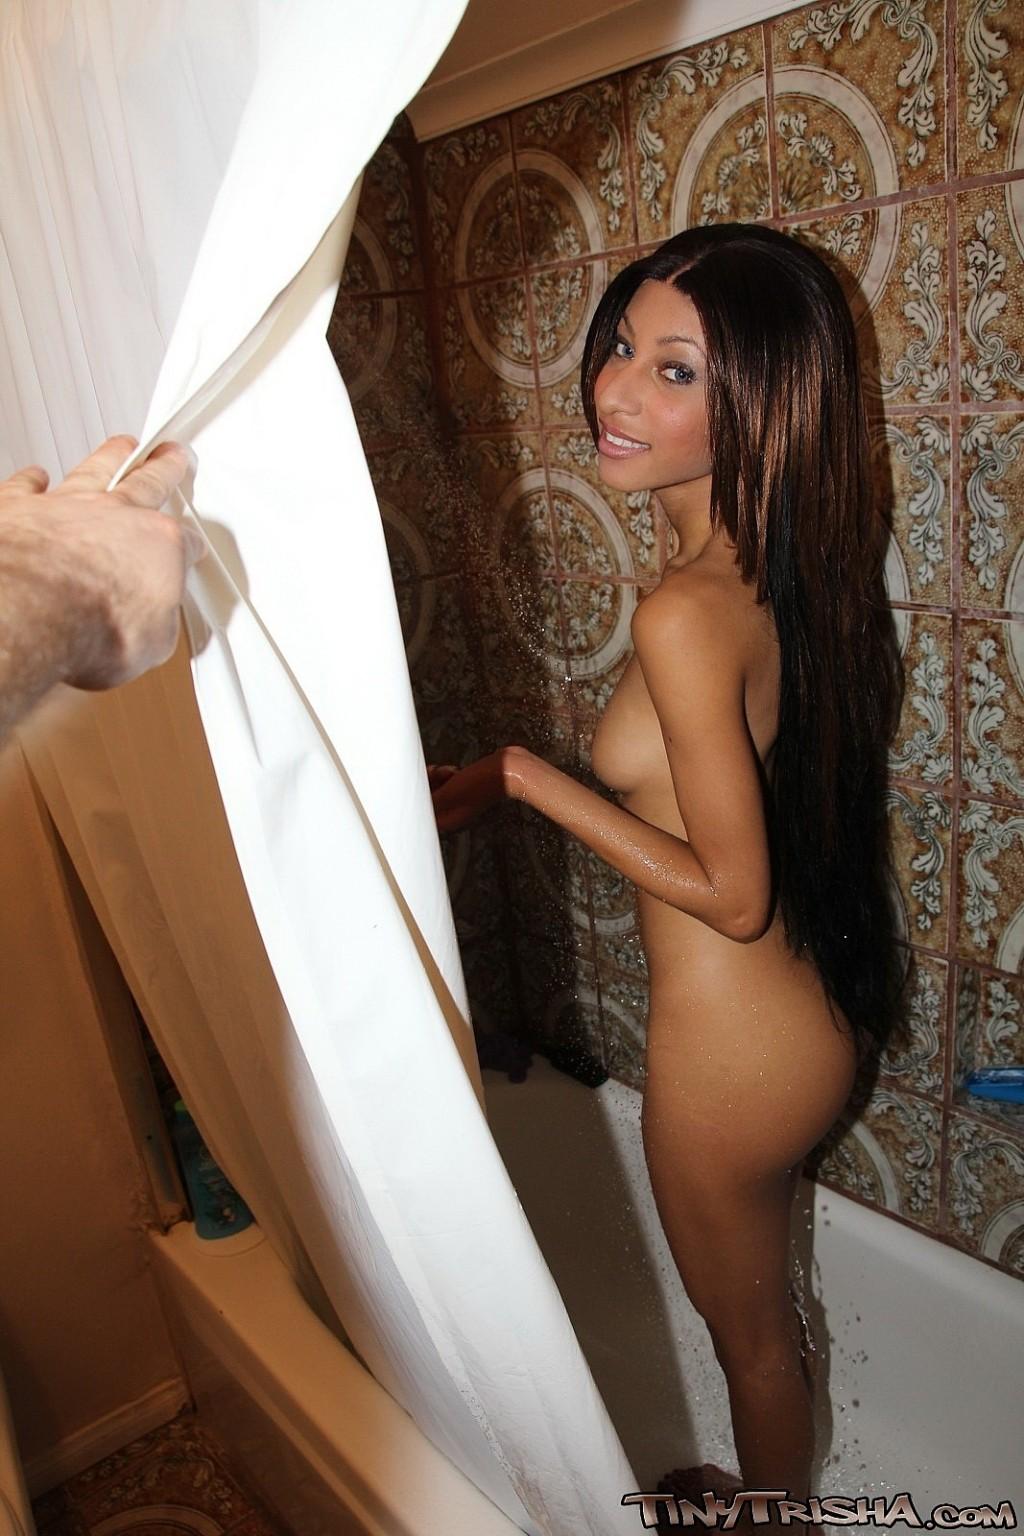 Hot nude girls smoking bongs